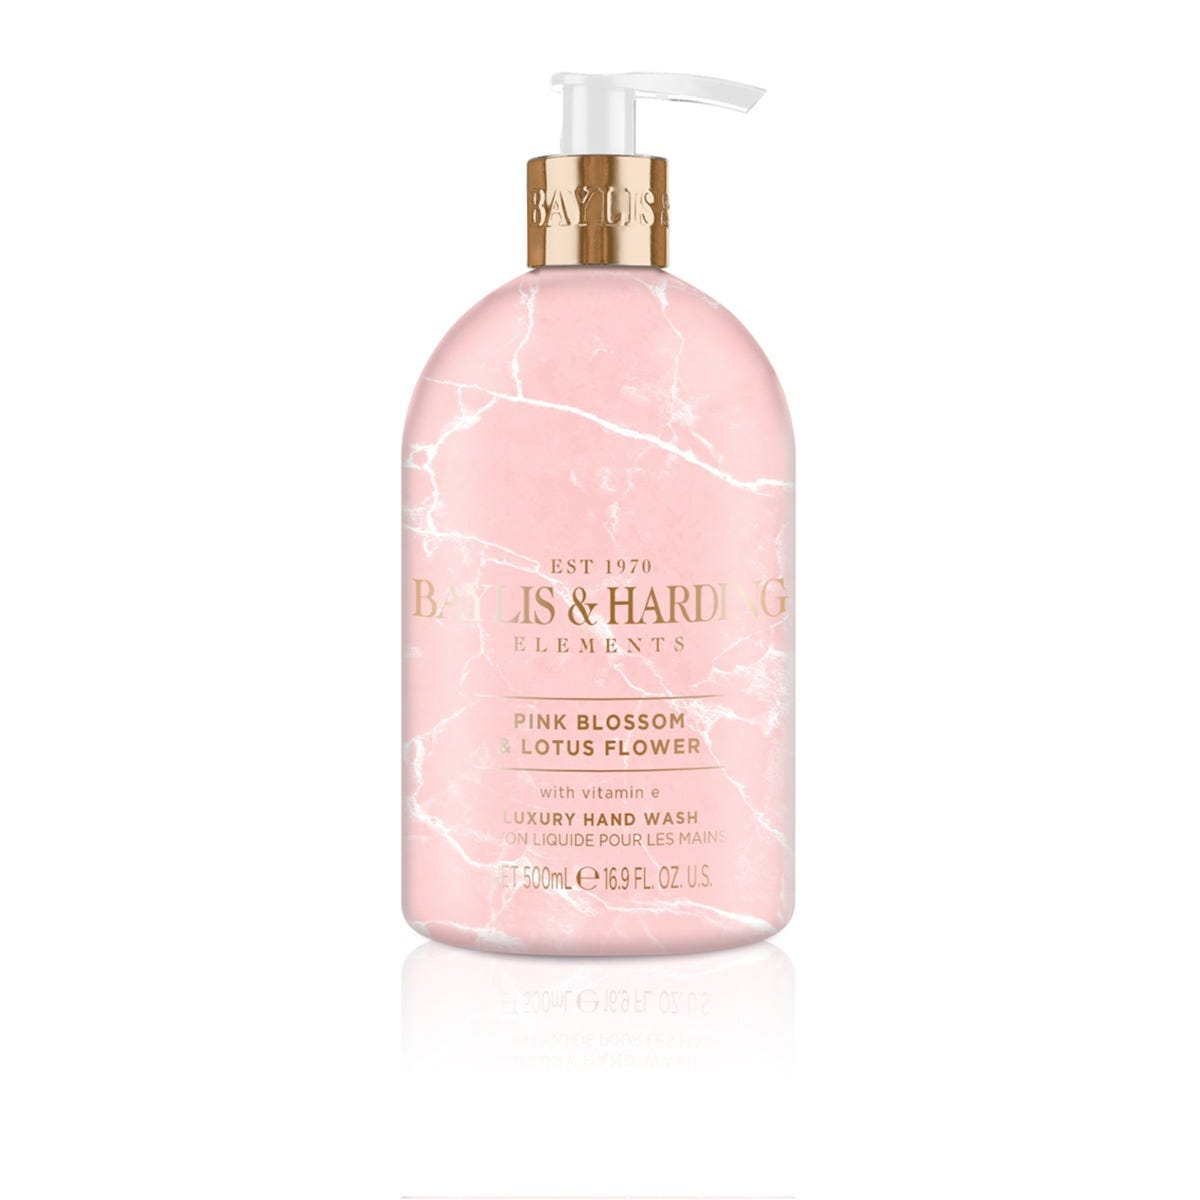 Jabón para manos Baylis & Harding® aroma flores rosadas